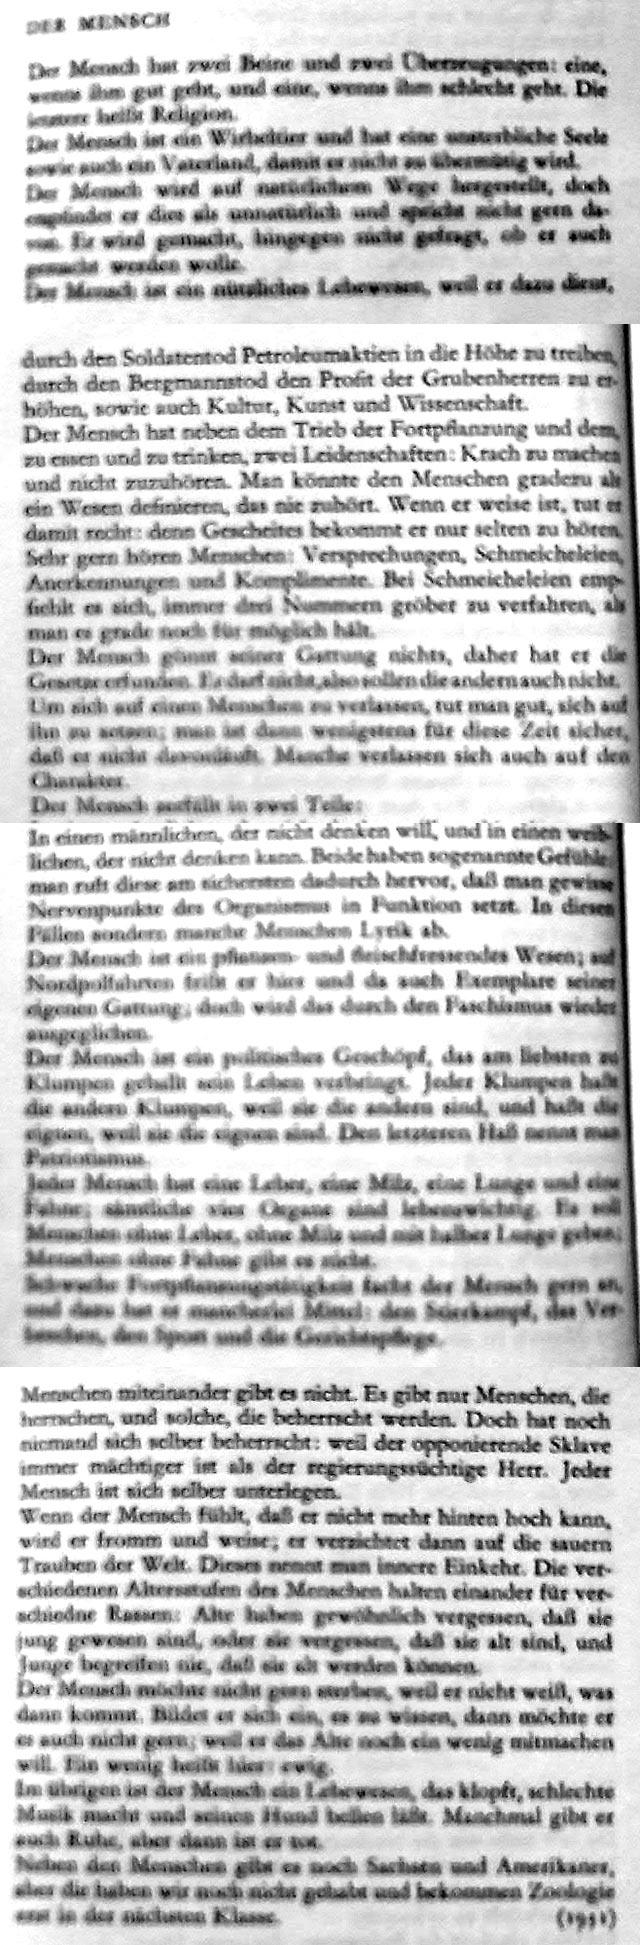 Kurt Tucholsky - Der Mensch